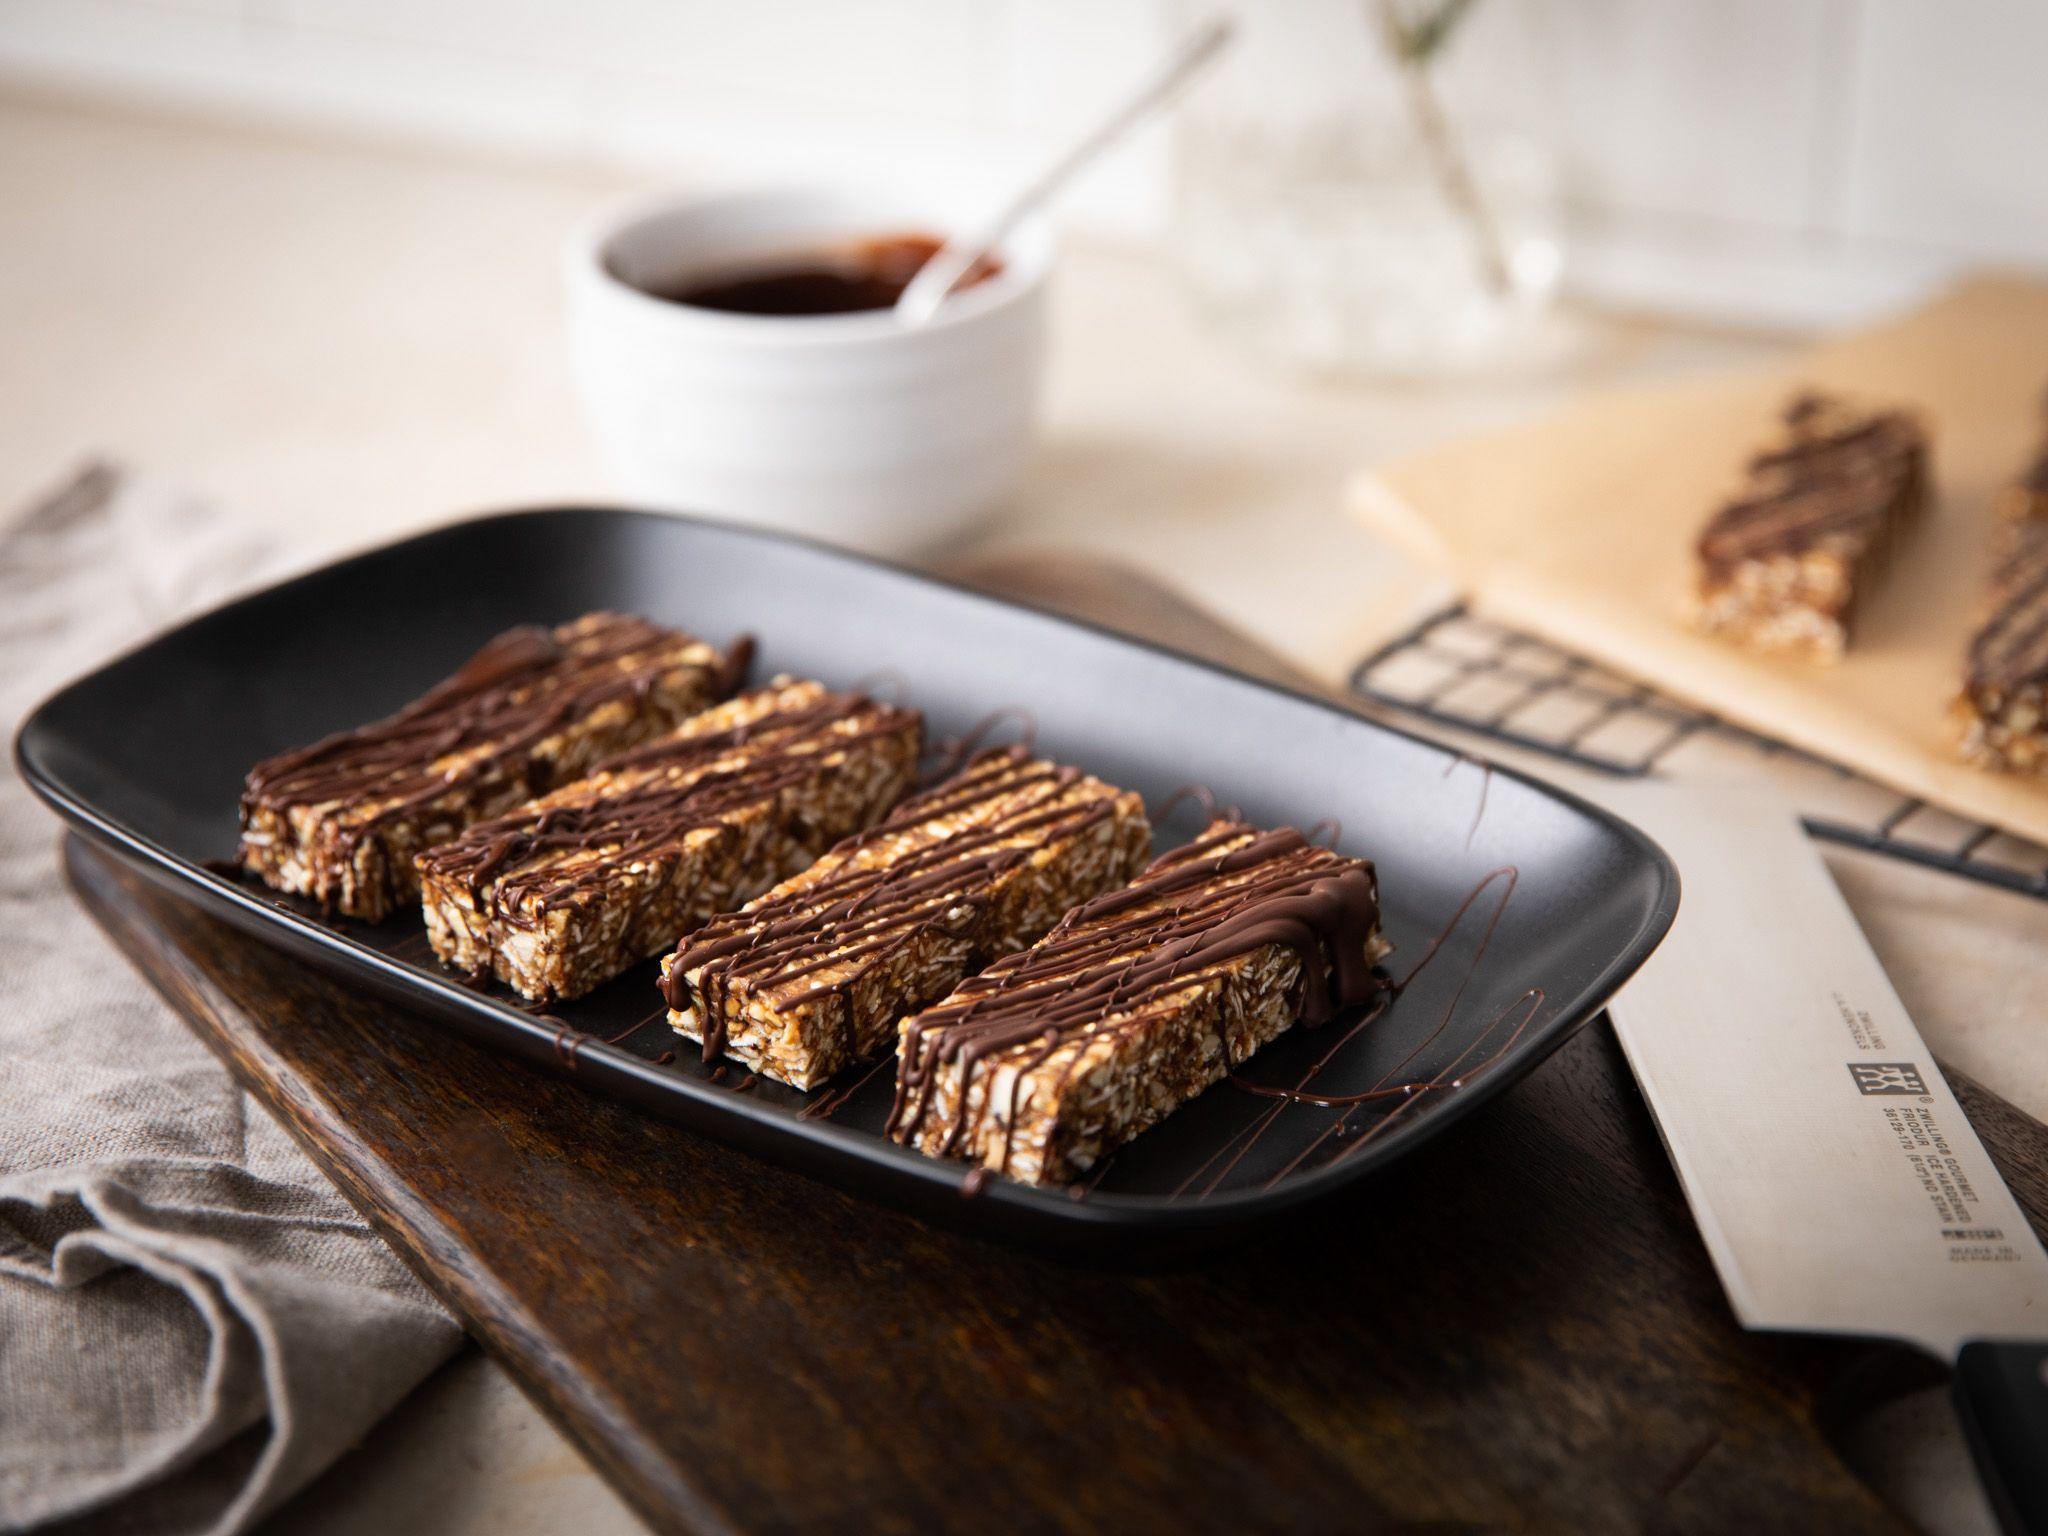 No bake quinoa energy bars